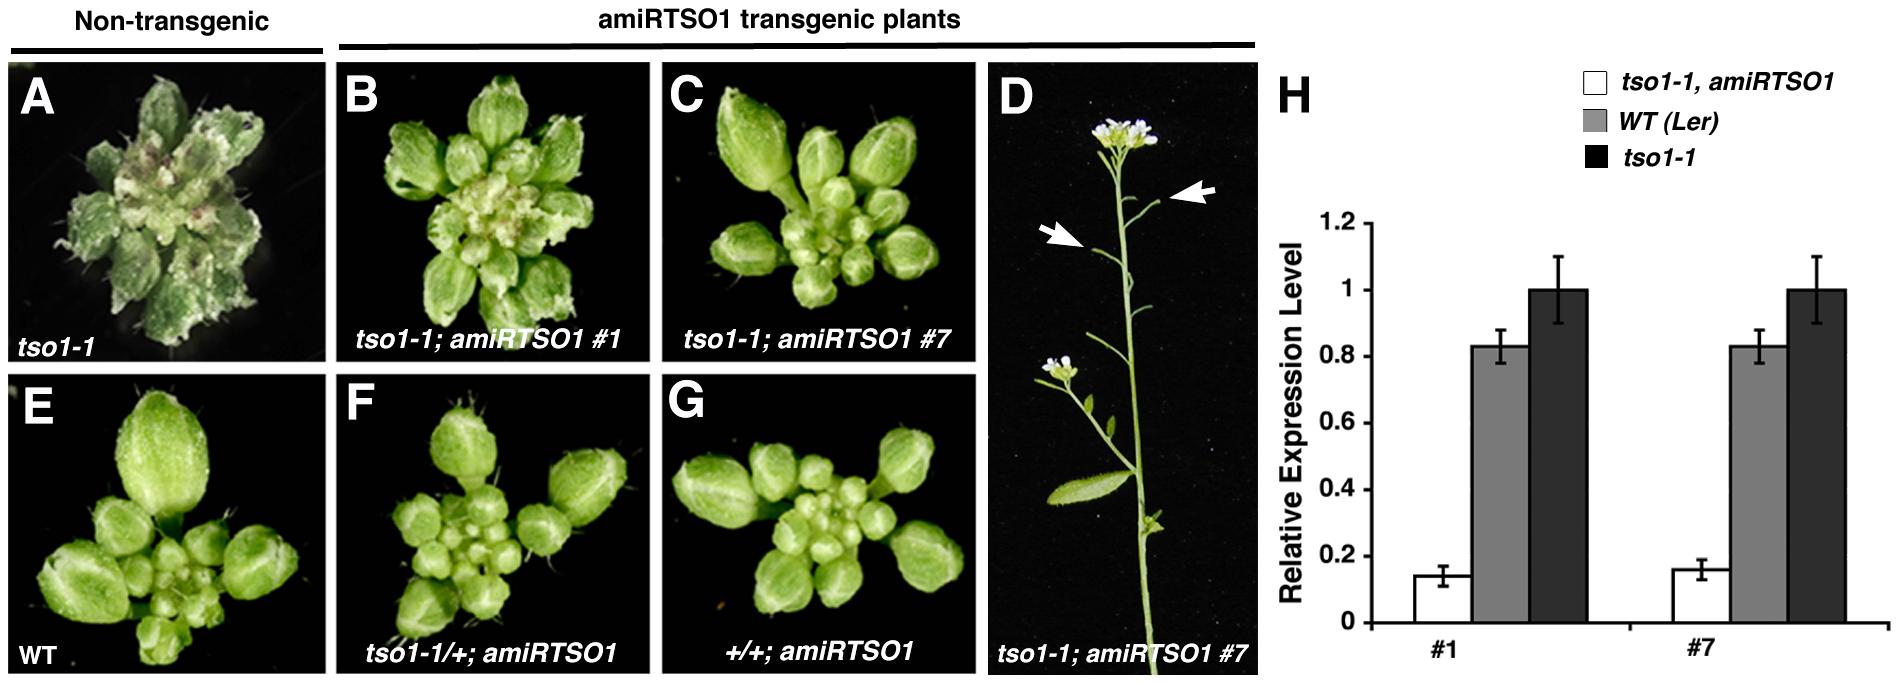 Artificial microRNA knockdown of <i>tso1-1</i> transcripts suppresses <i>tso1-1</i> phenotype.